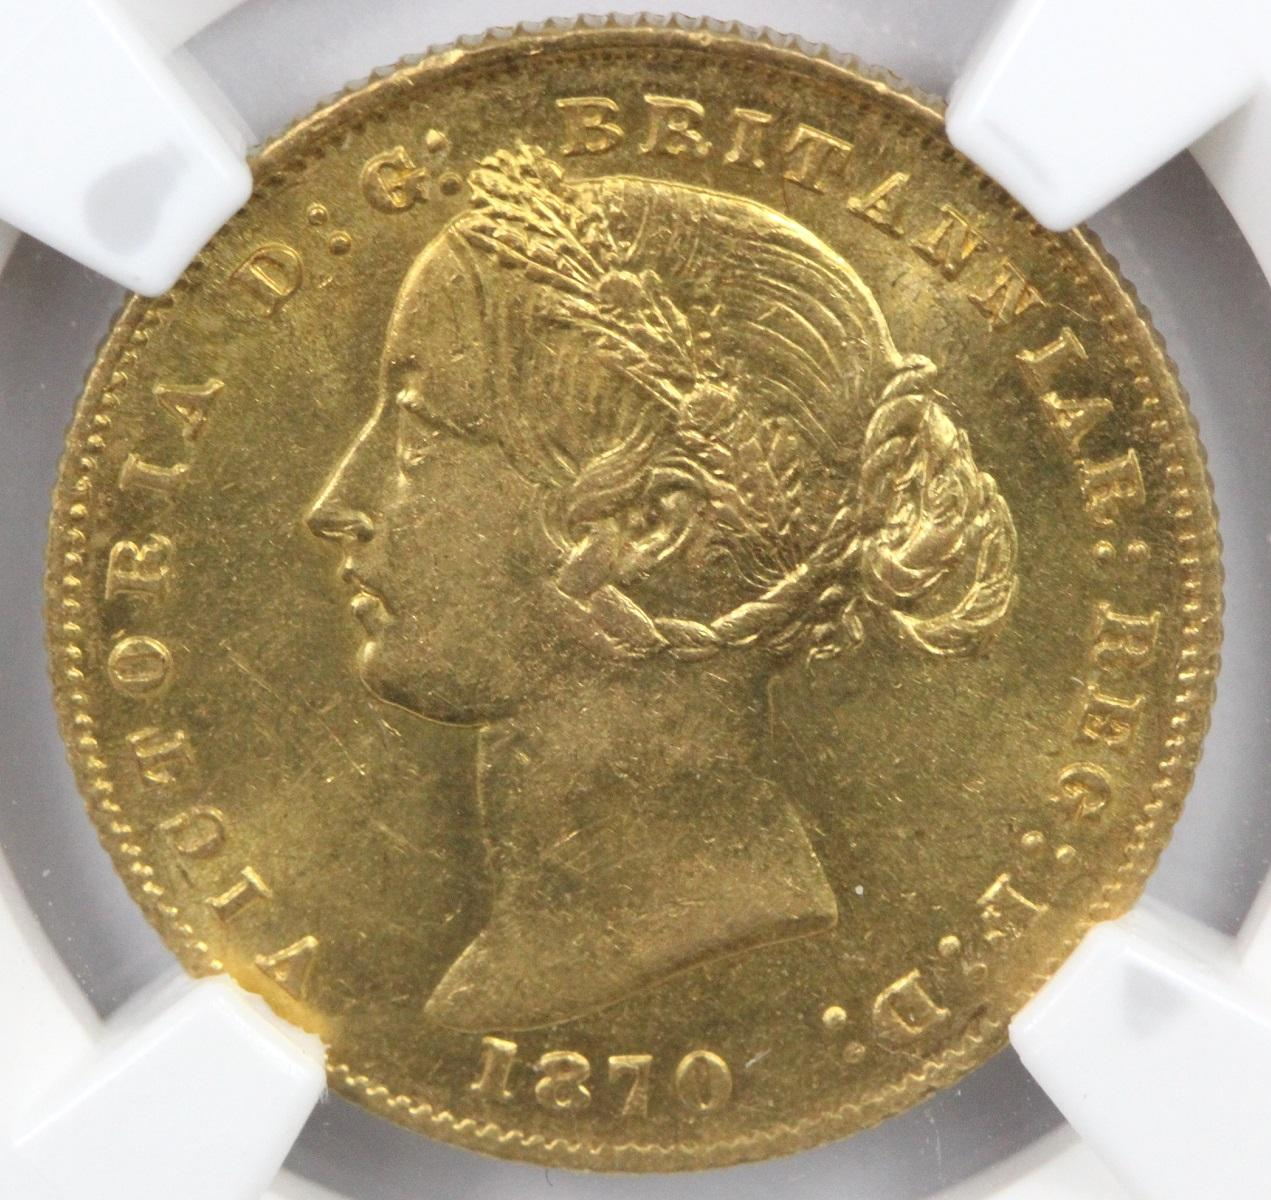 Australia. 1870 'Sydney Mint' Gold (0.916) Sovereign, NGC MS61